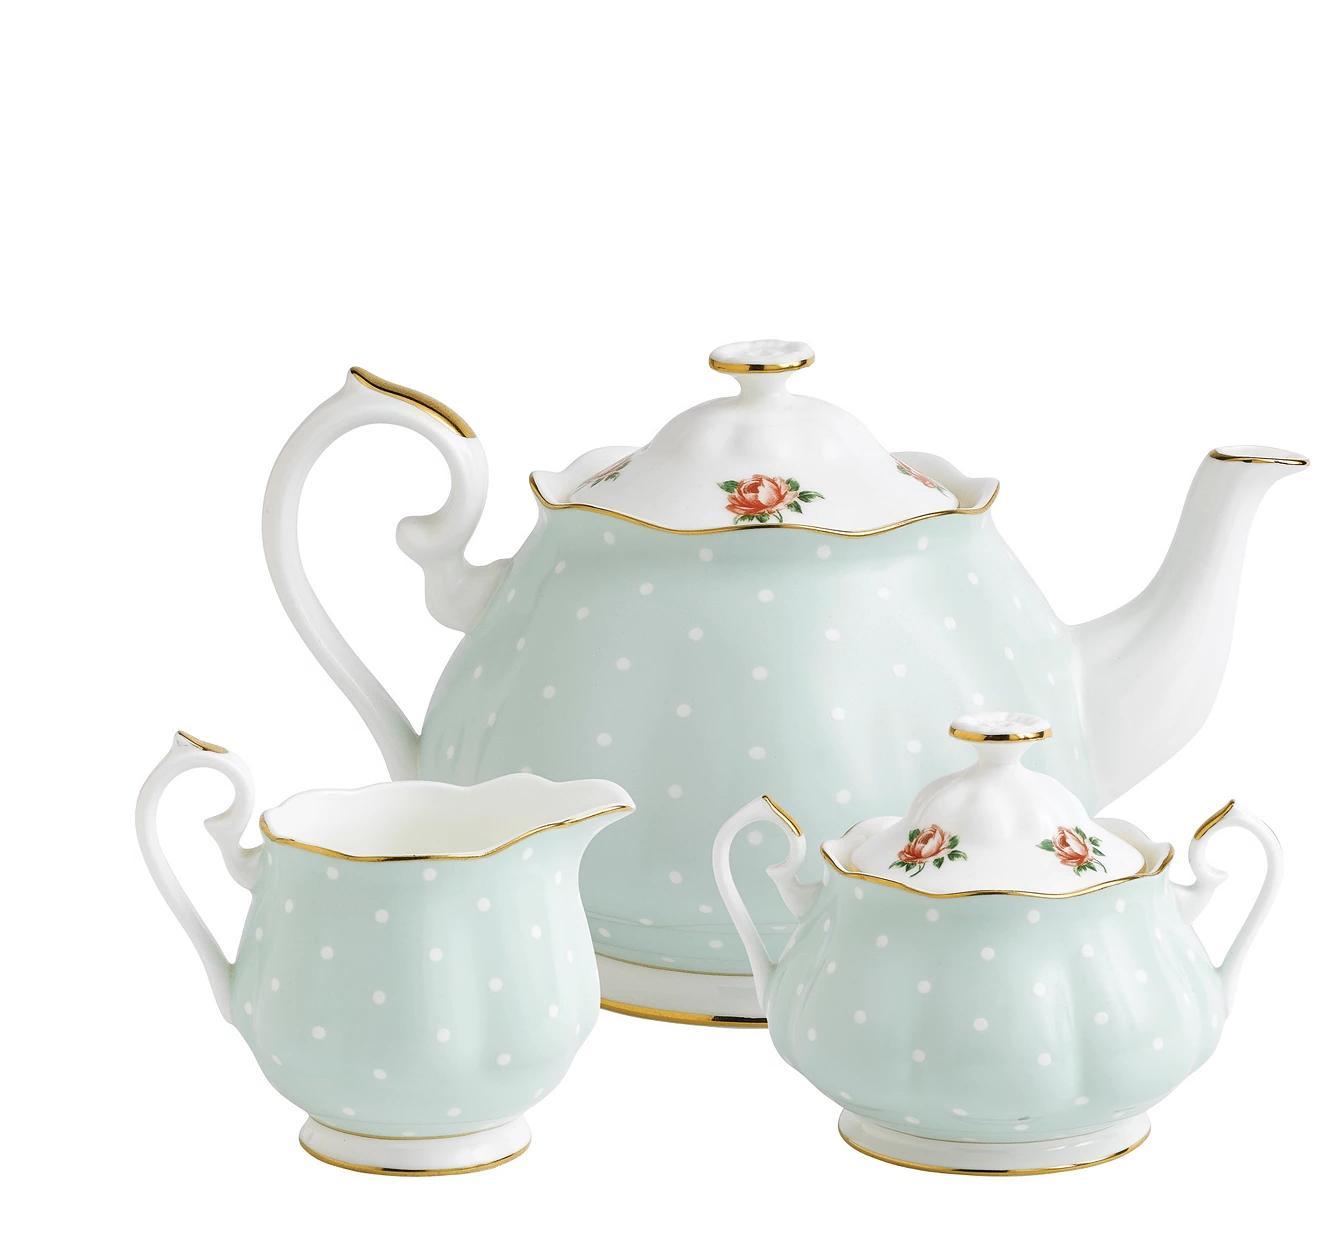 Royal Albert China Polka Rose 3 Pc Teaset - Teapot, Sugar, C